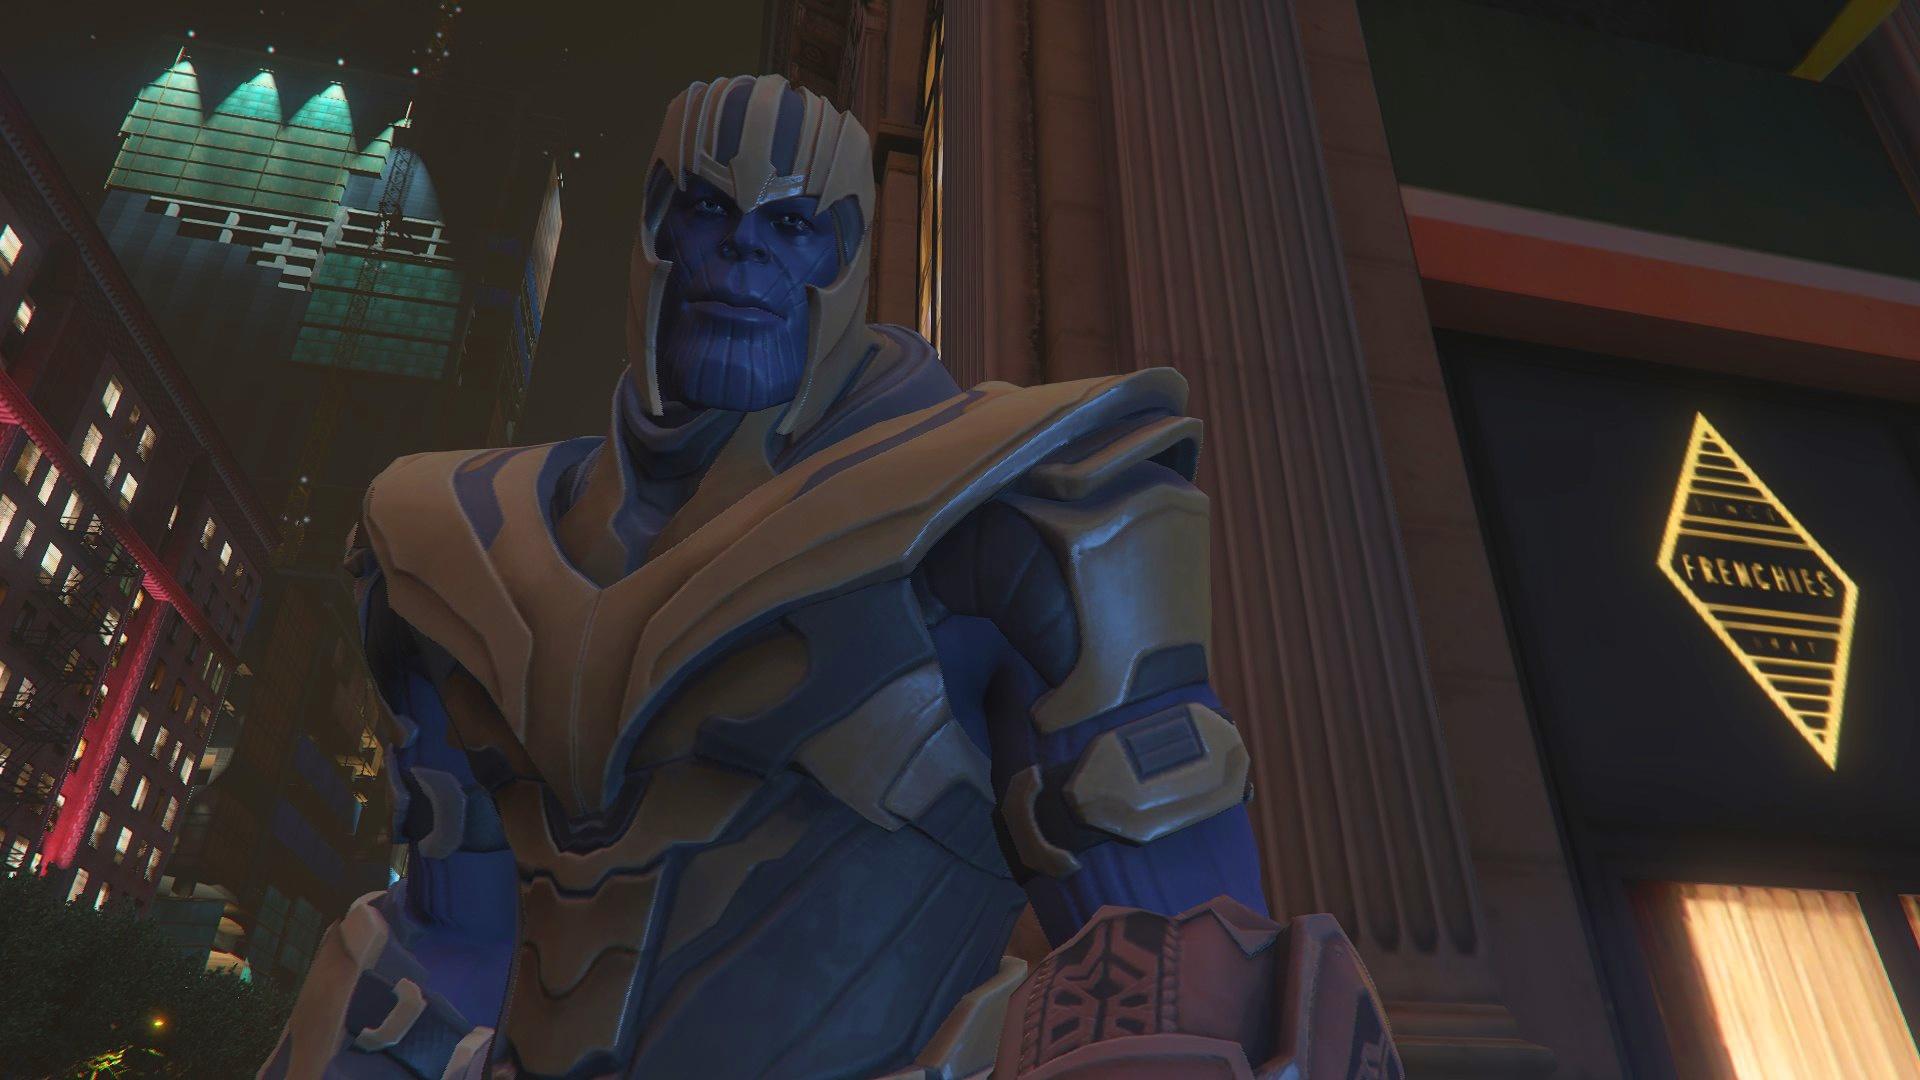 Thanos Fortnite Version [Add-on Ped] 1.0